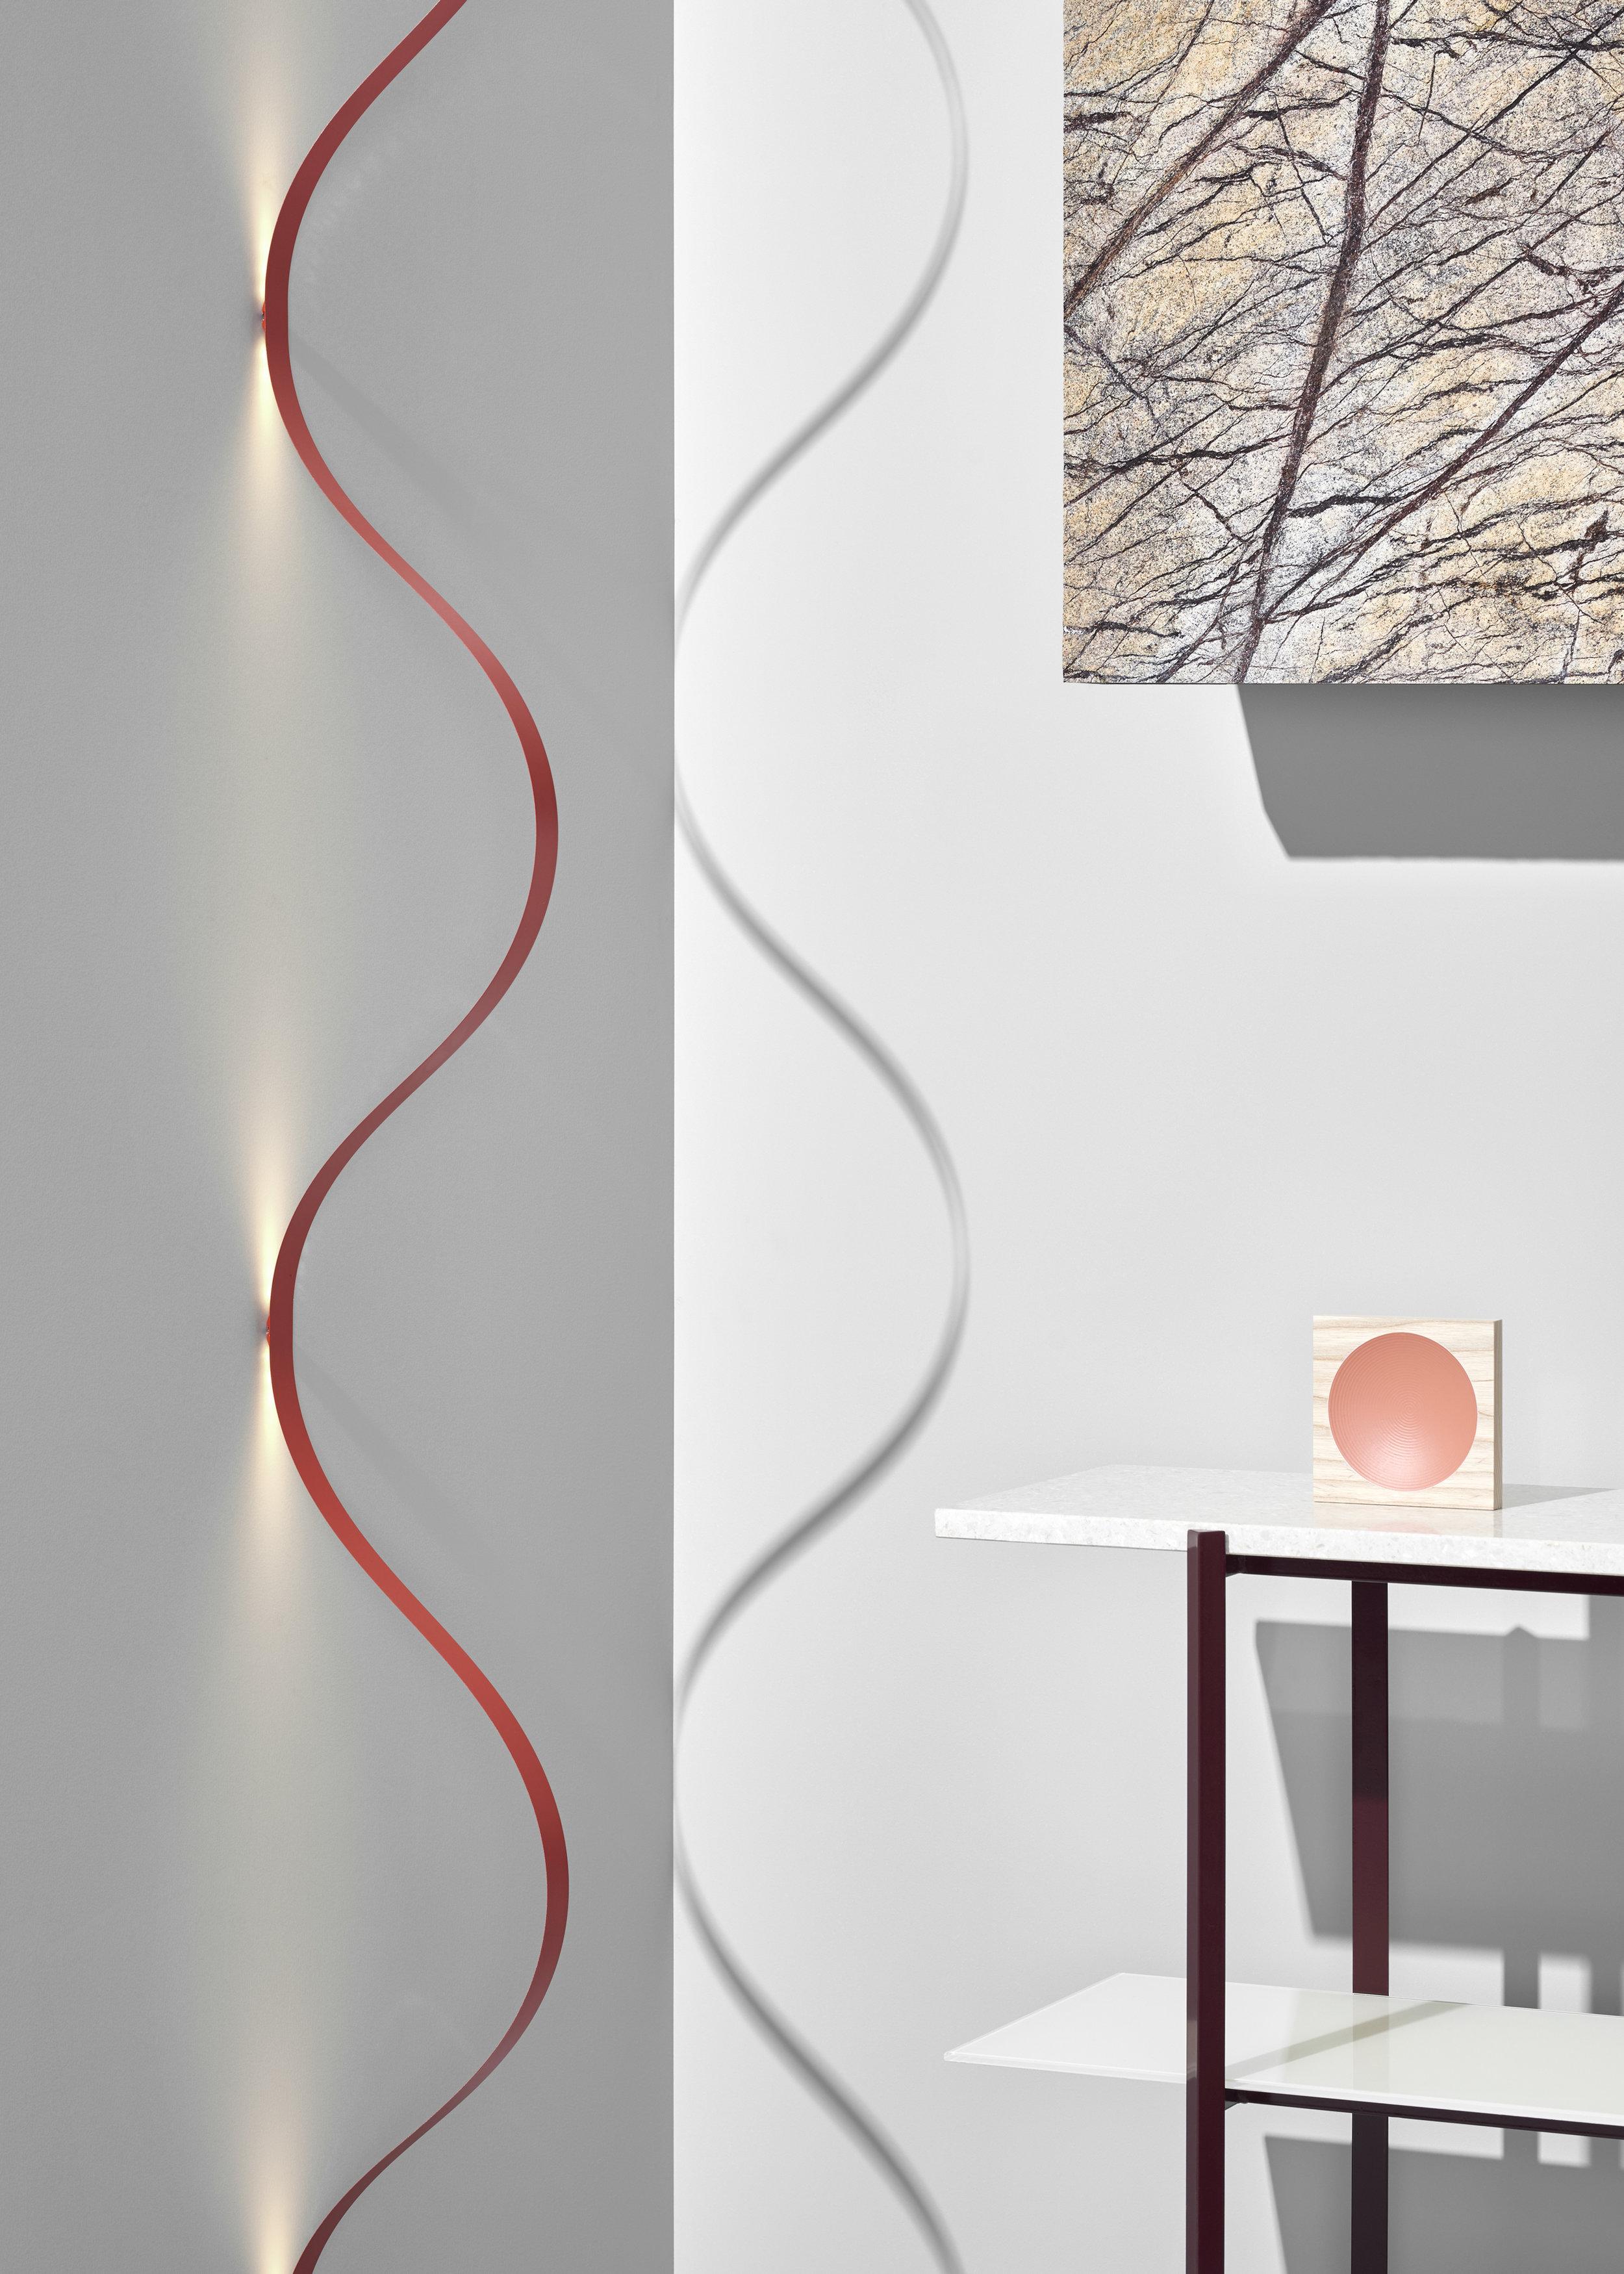 Milan 2019 - David Derksen Design - A.jpg